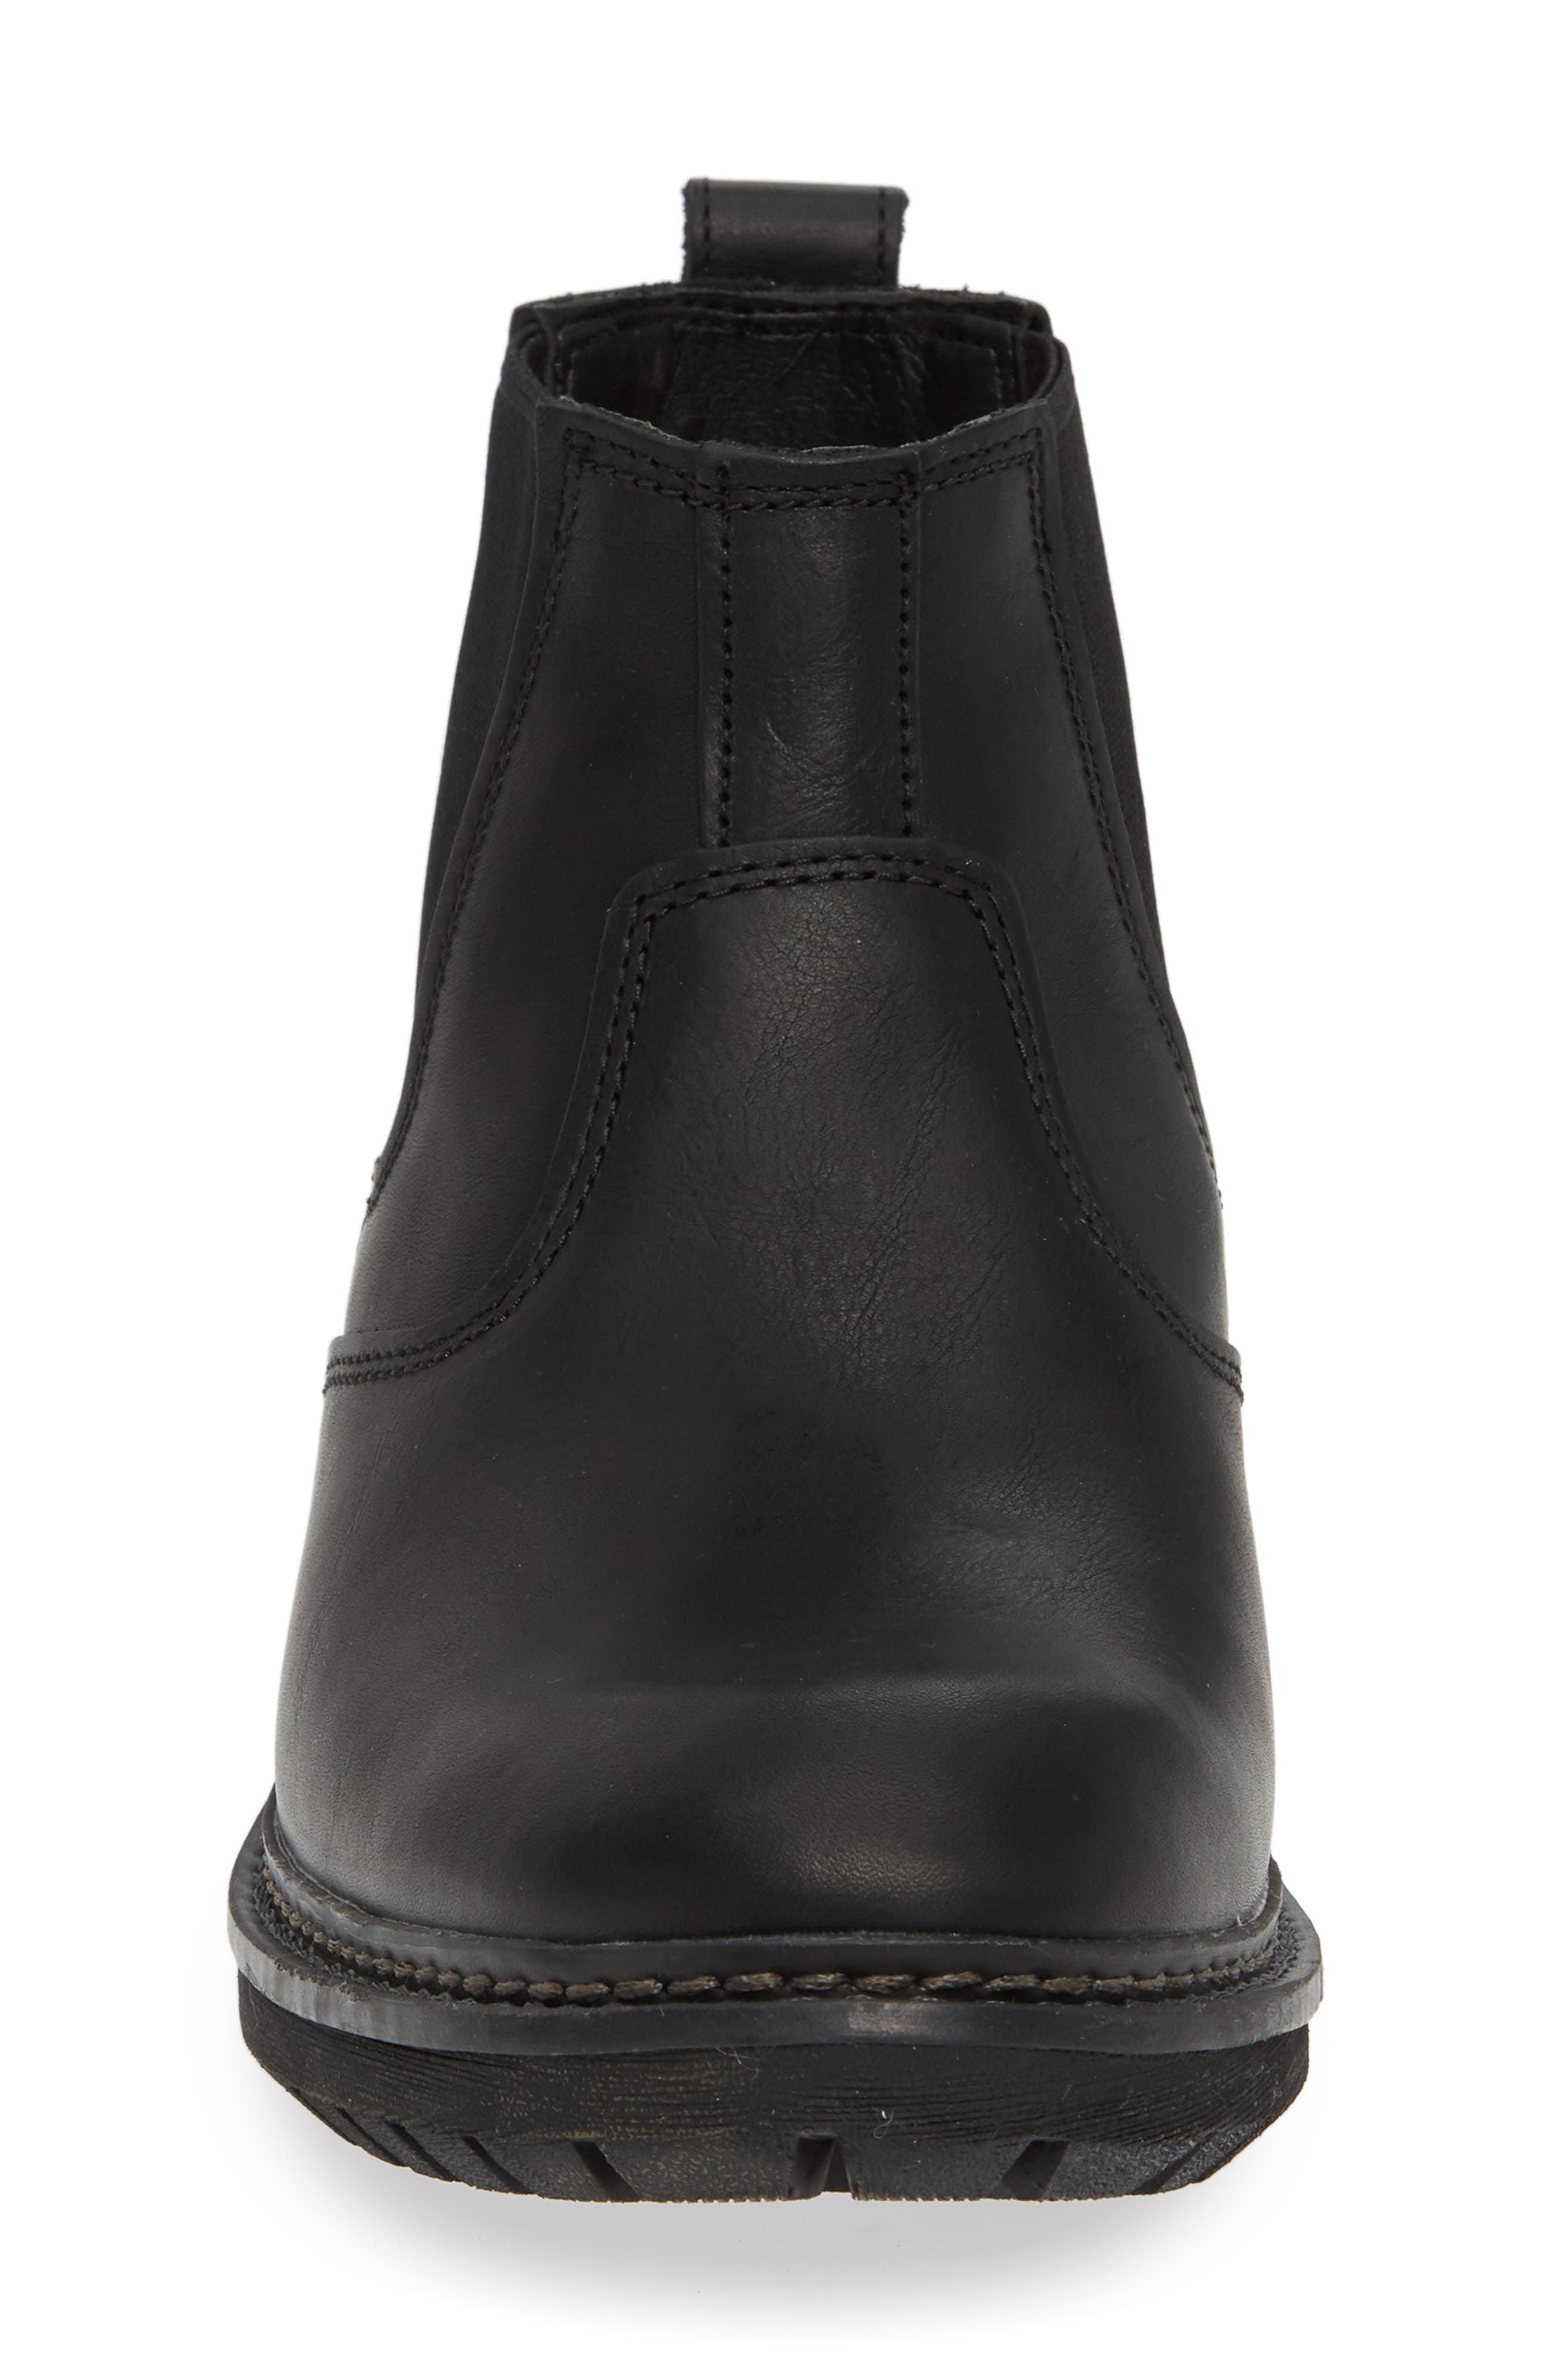 Logan Bay Water Resistant Chelsea Boot,                             Alternate thumbnail 4, color,                             BLACK LEATHER